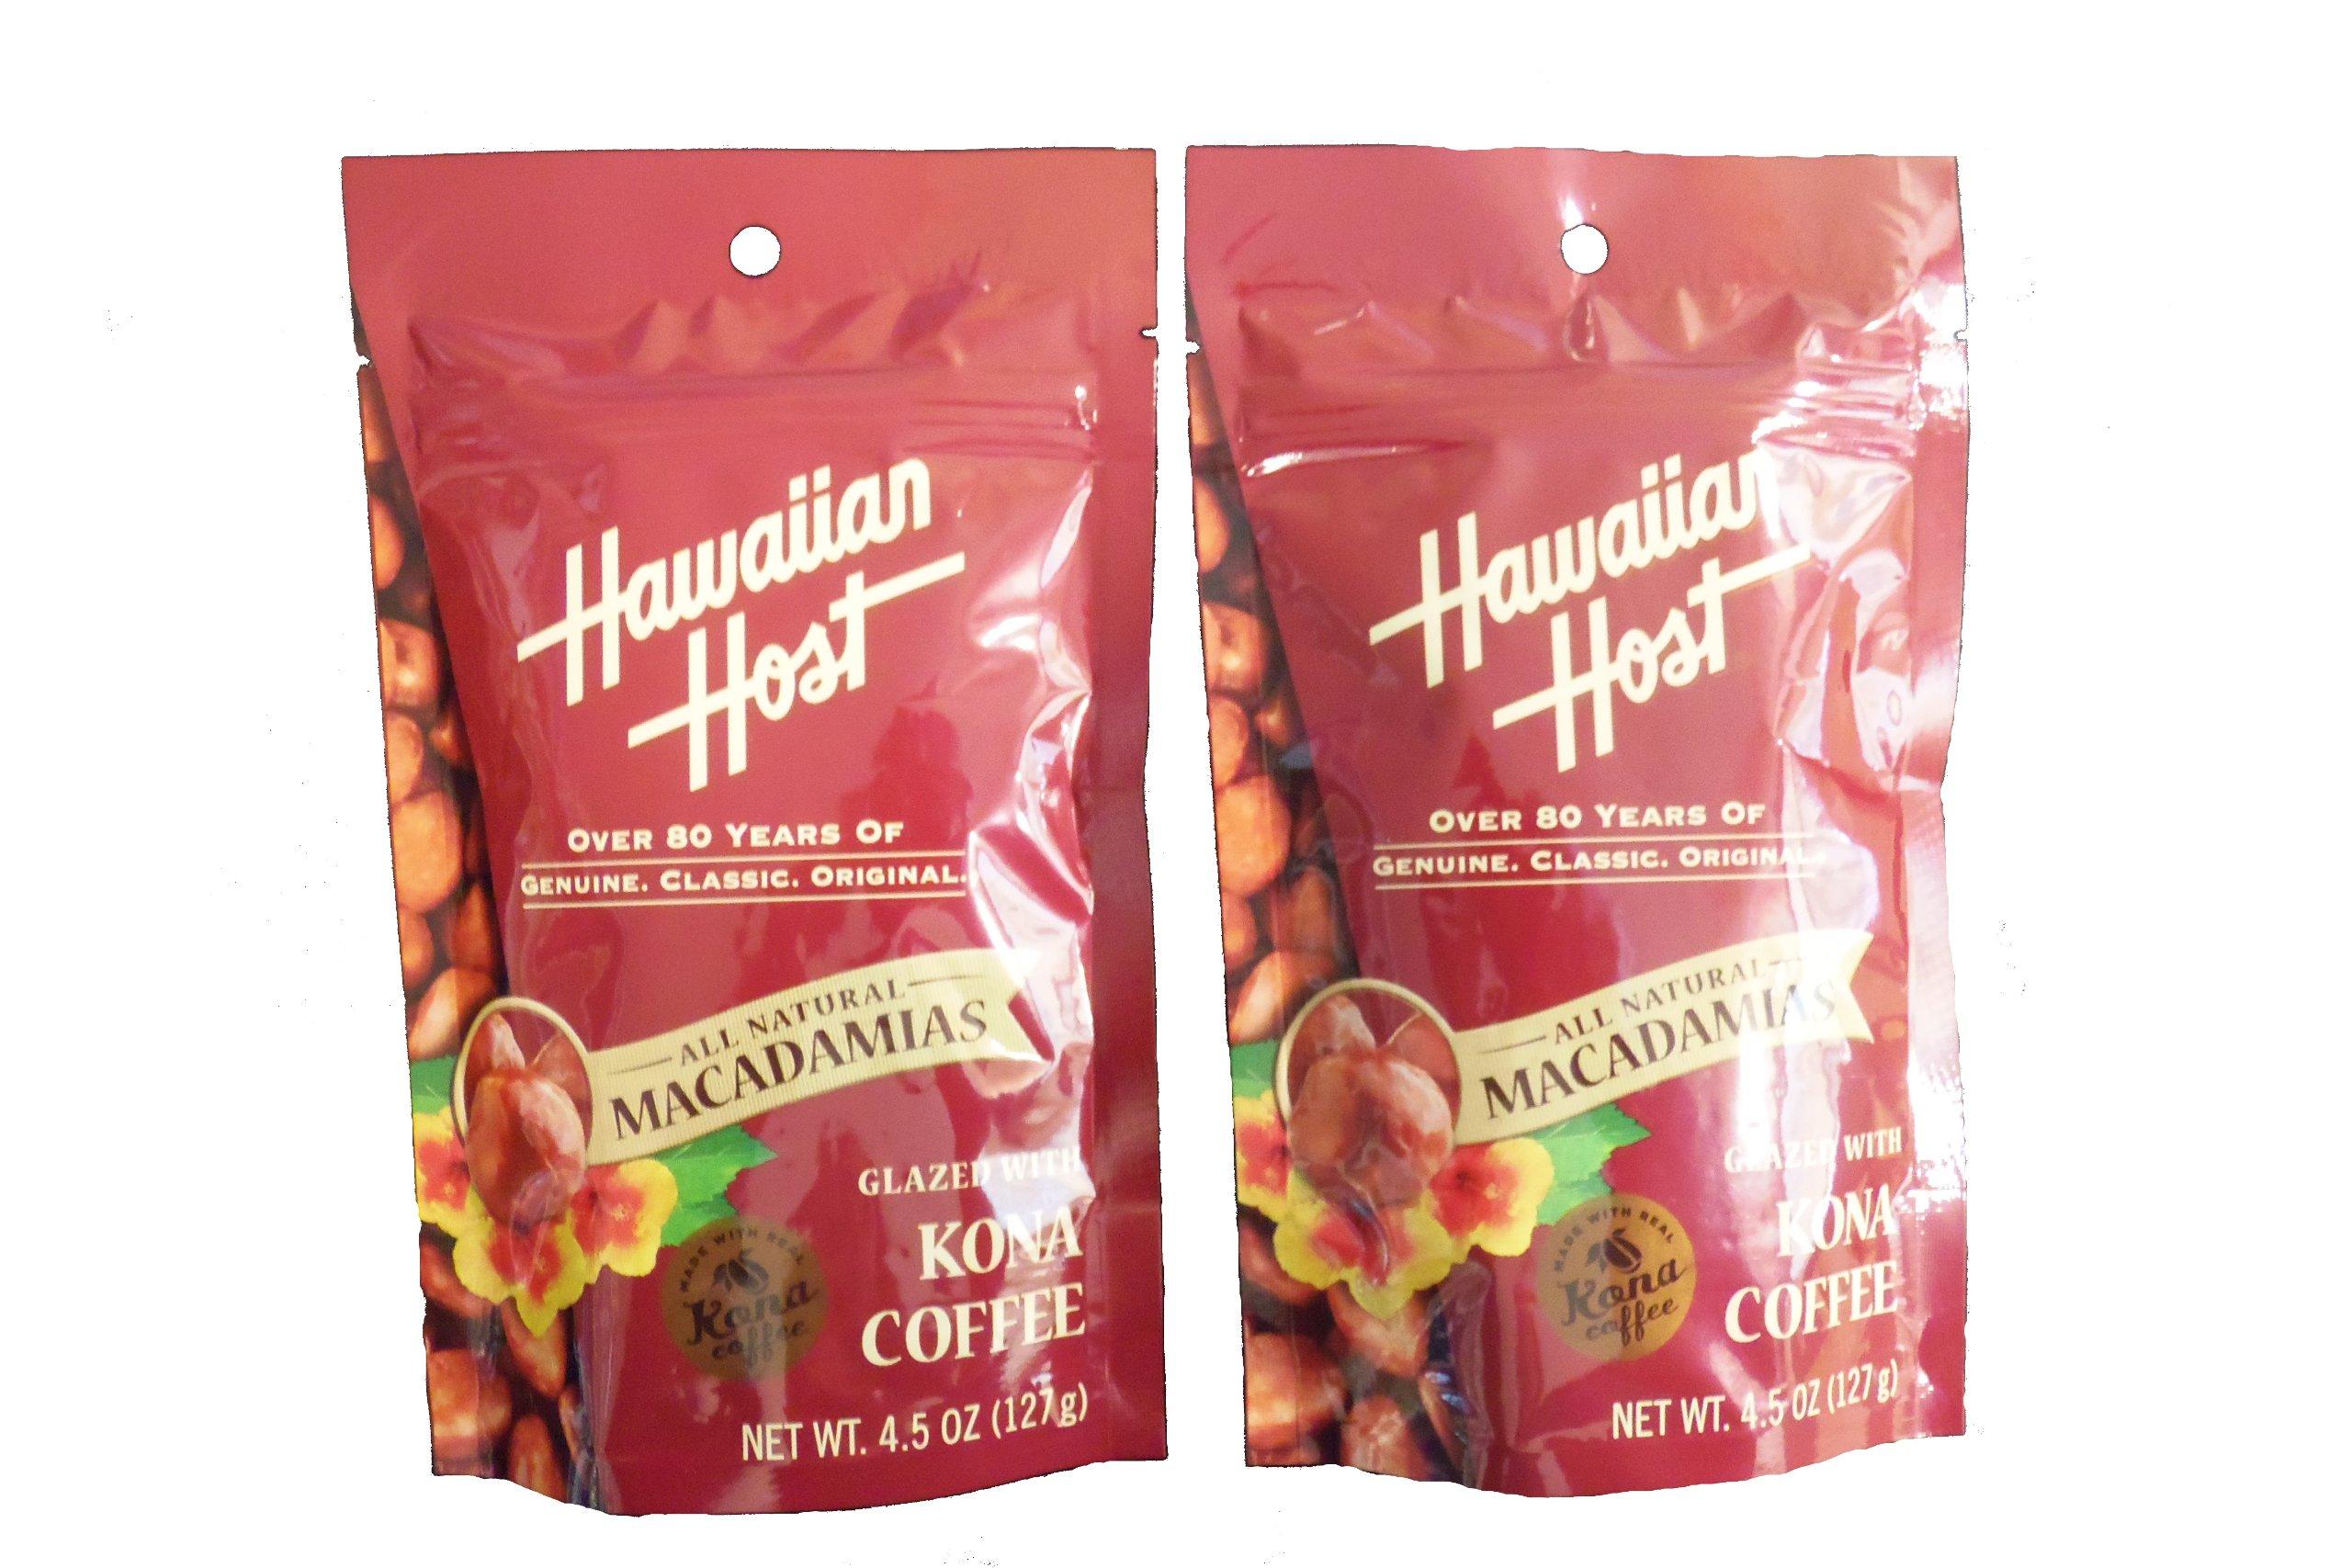 Hawaiian Host Macadamia Nuts - Glazed with KONA COFFEE - 2 Bags, 4.5 Oz each